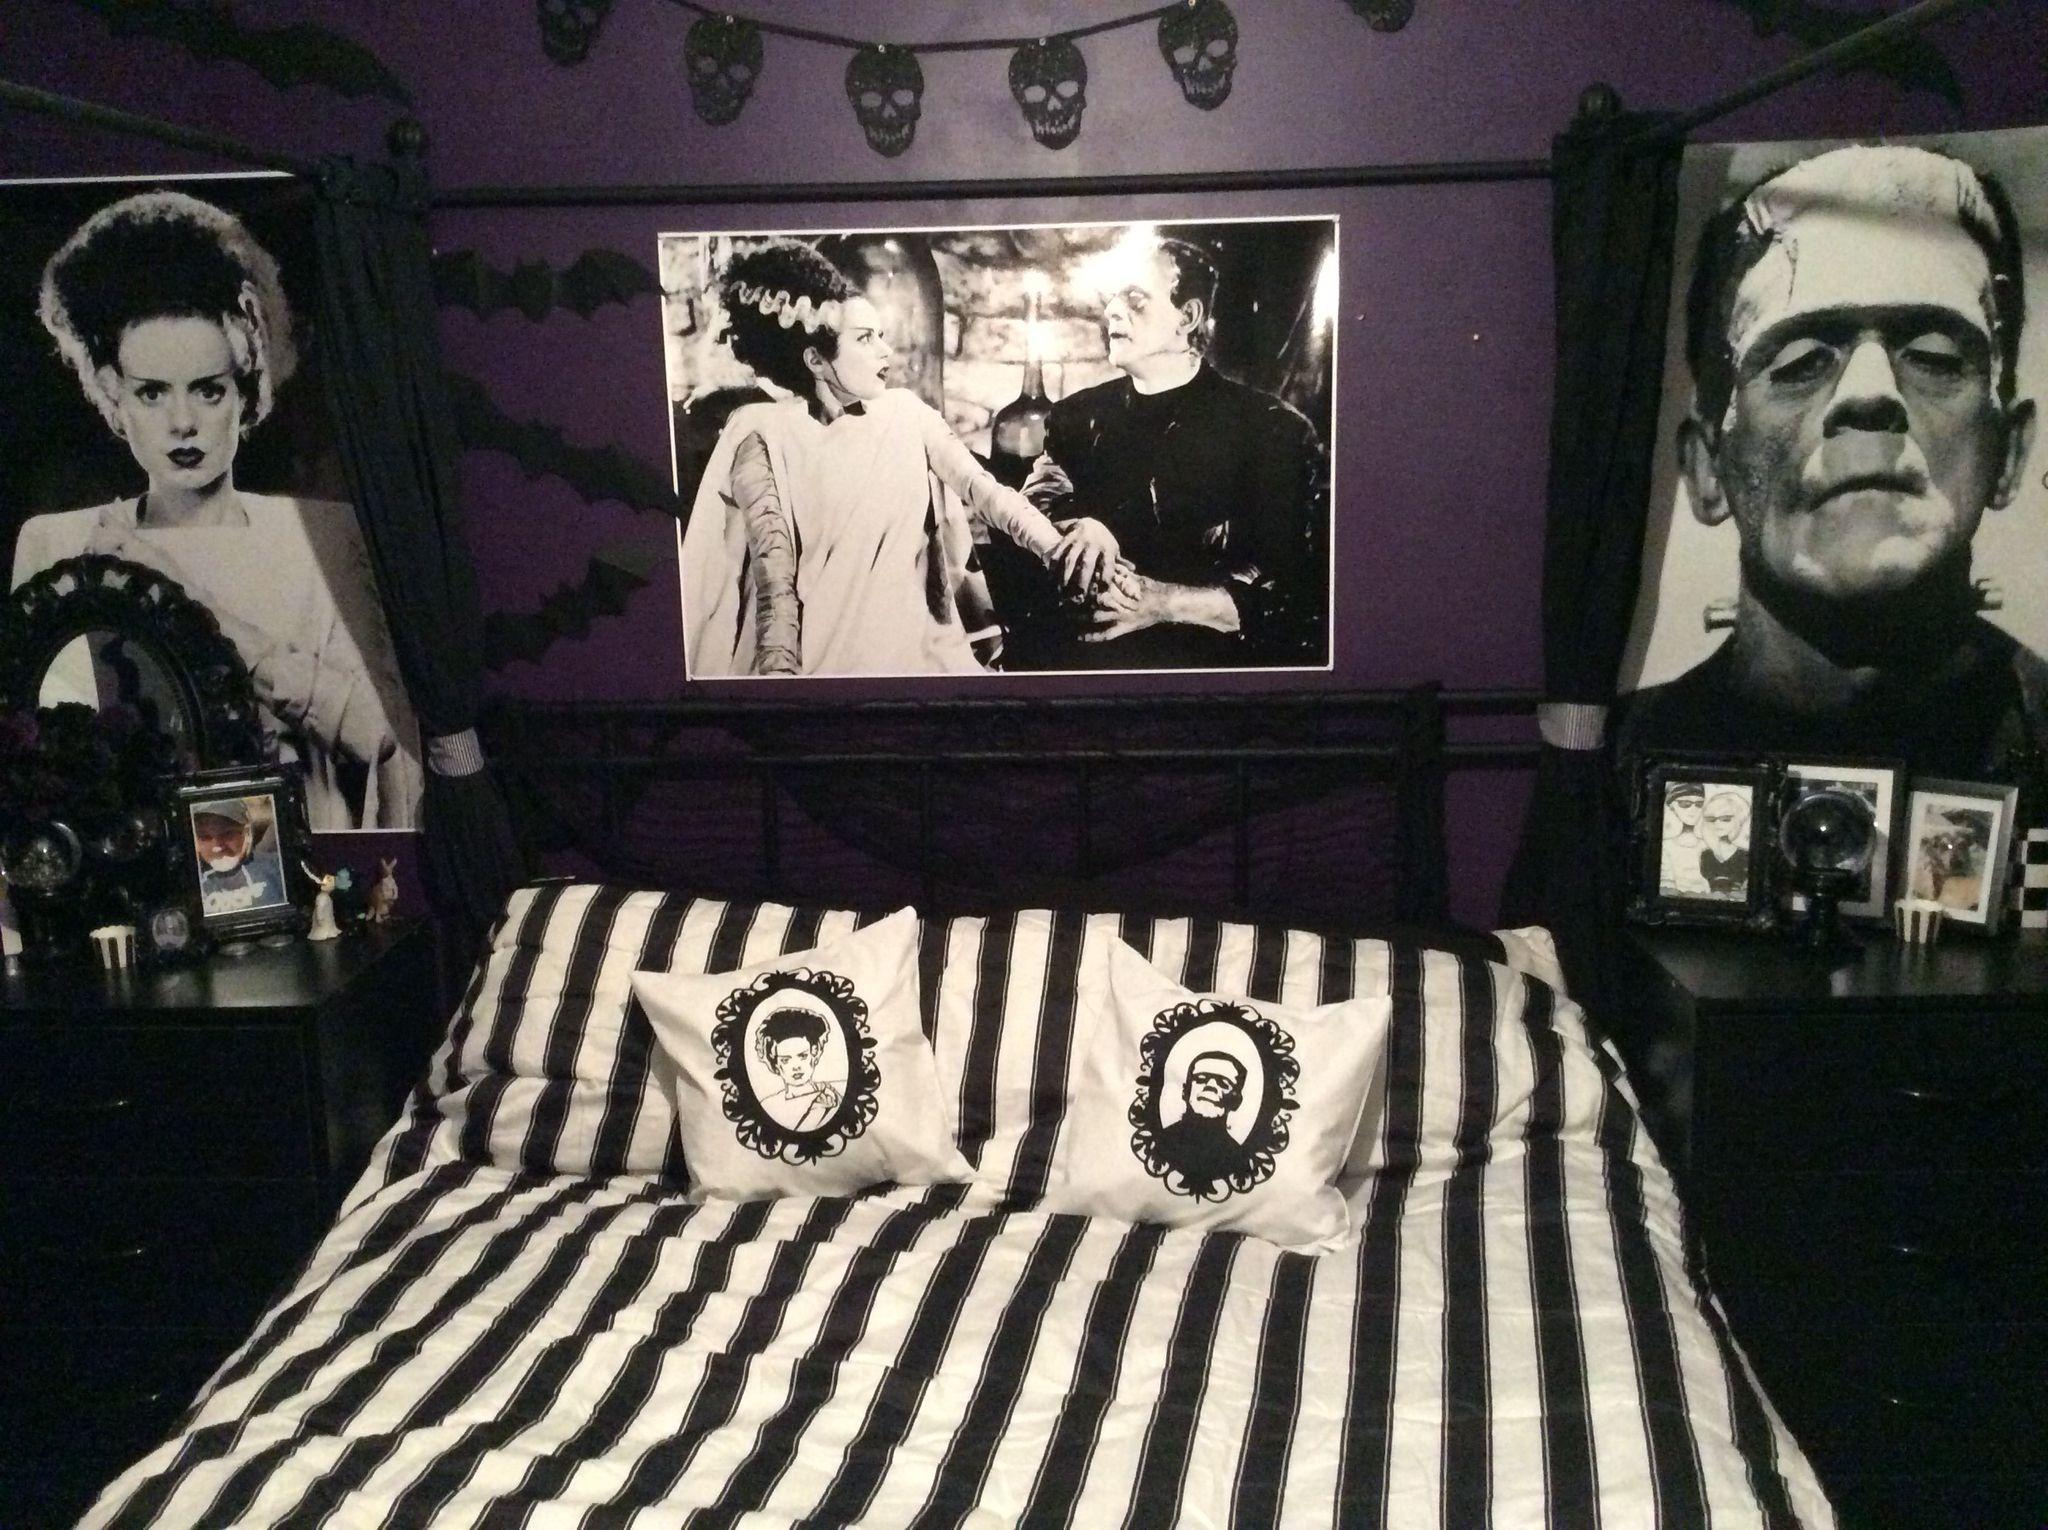 best 20 horror decor ideas on pinterest geek room geek decor frankenstein bride bedroom